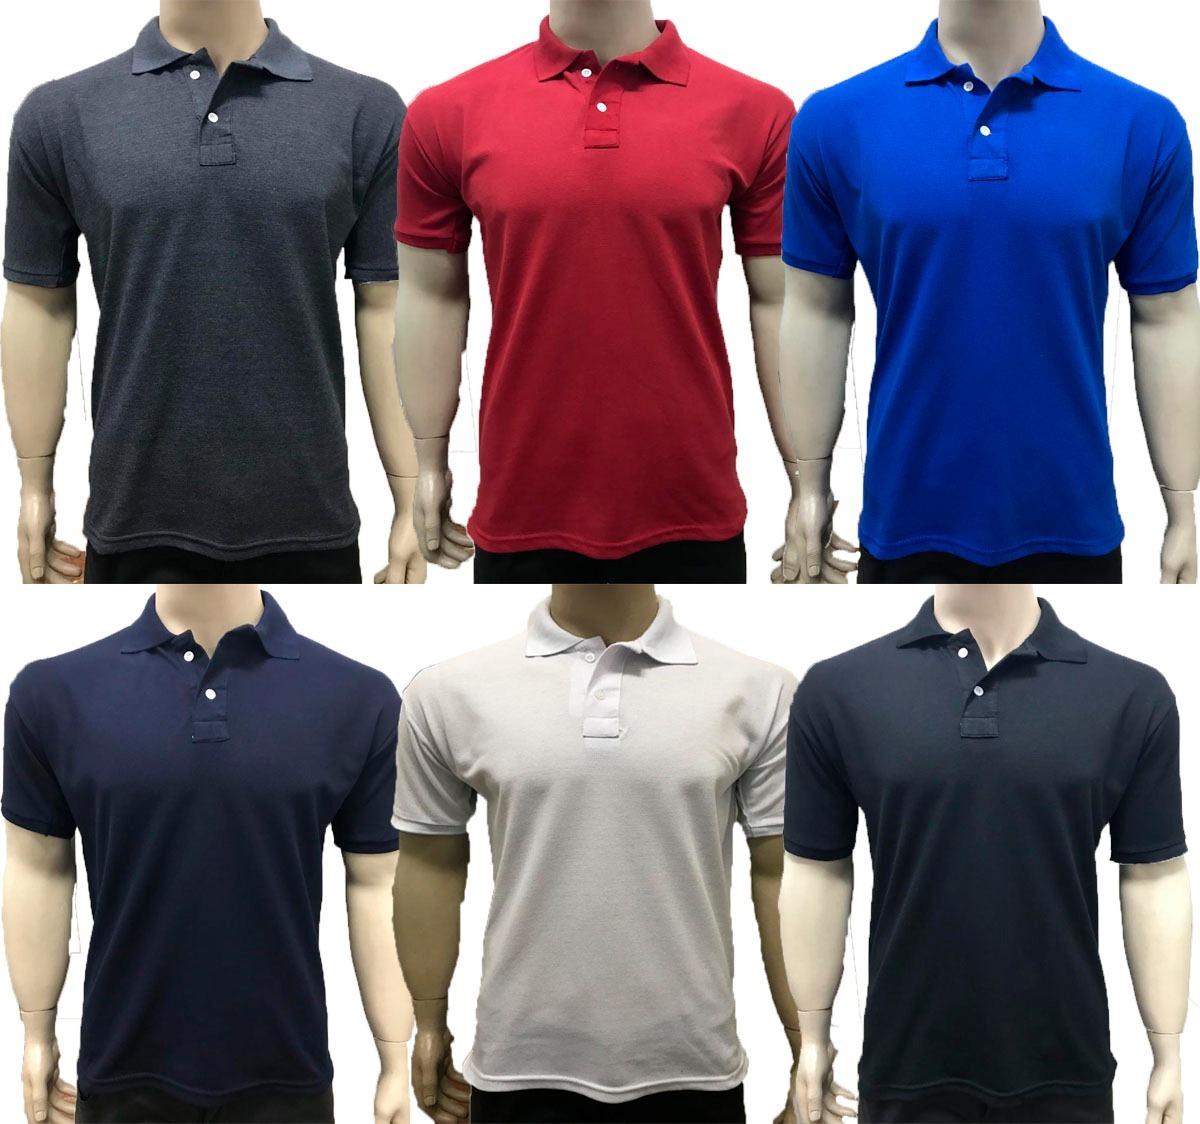 e23bf6d271 Kit 5 Camisas Gola Polo Varis Marcas Atacado Revenda Lucre - R  120 ...